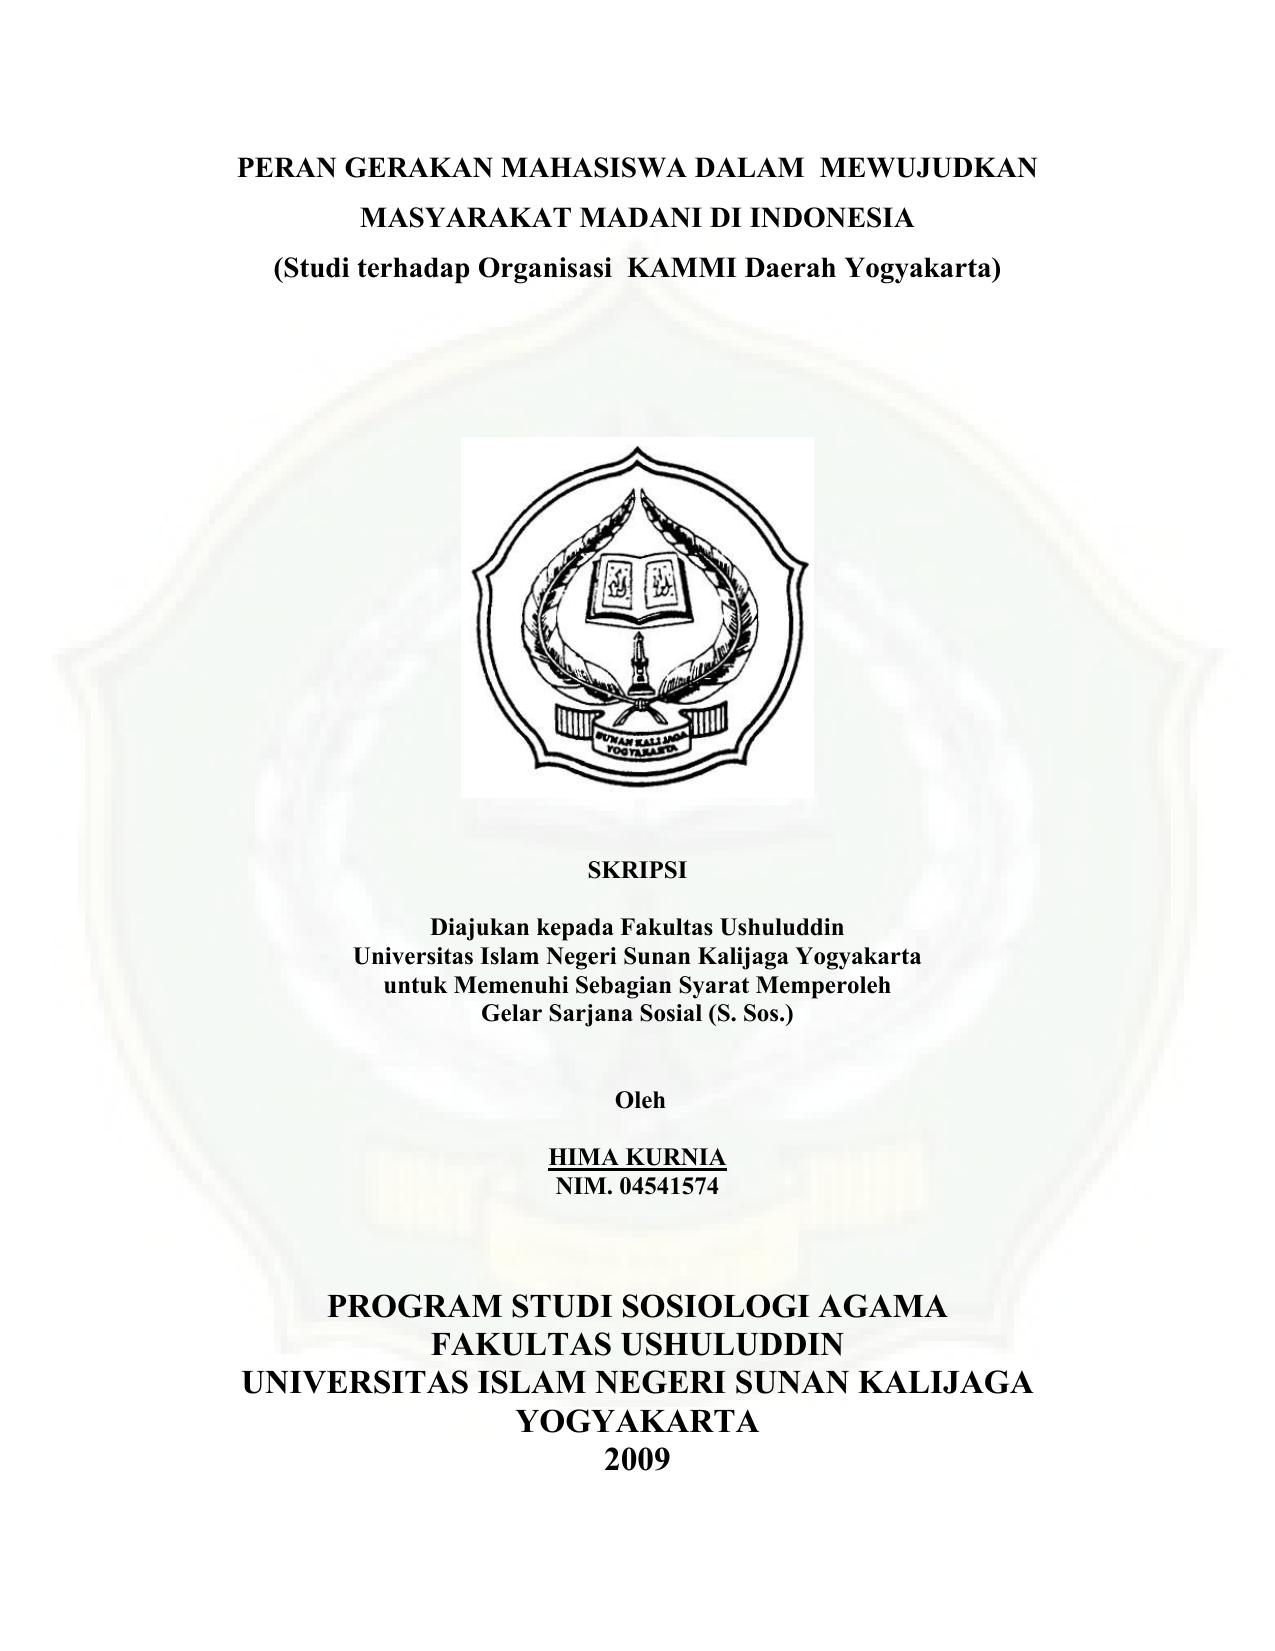 Program Studi Sosiologi Agama Fakultas Ushuluddin Universitas Islam